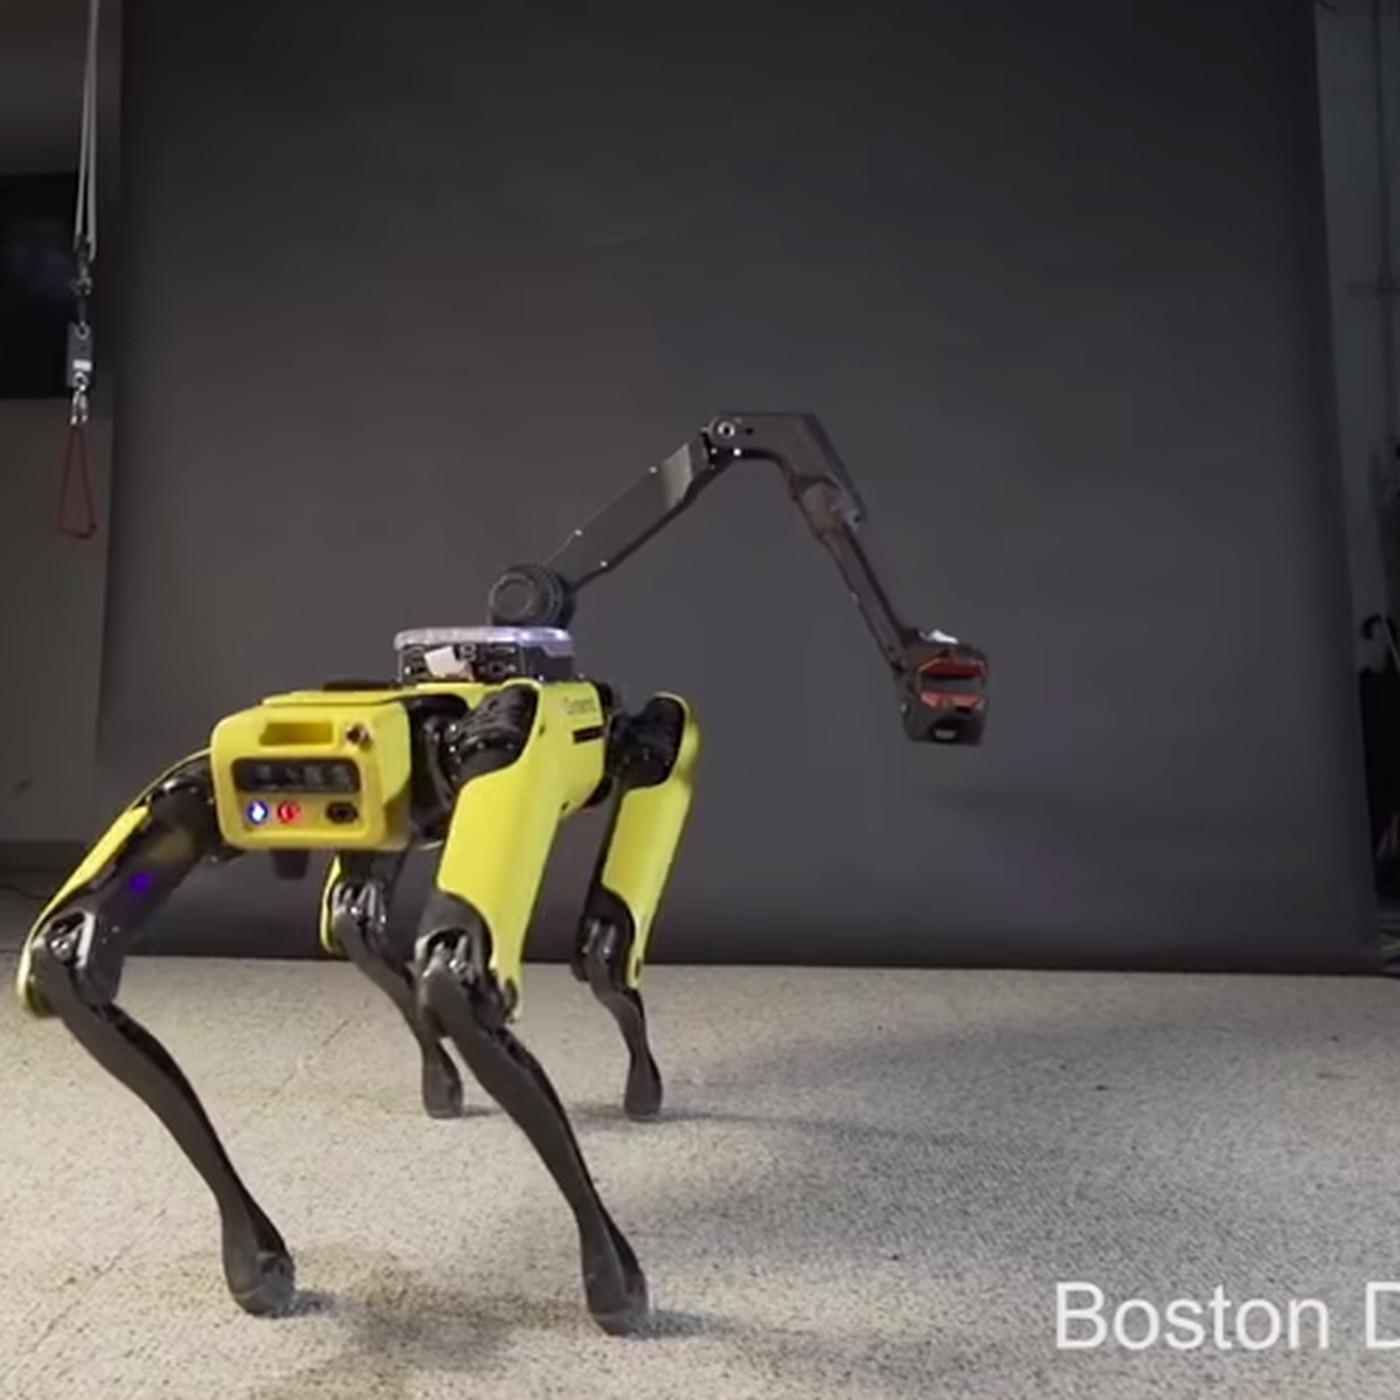 Boston Dynamics Four Legged Robot Can Now Do The Running Man The